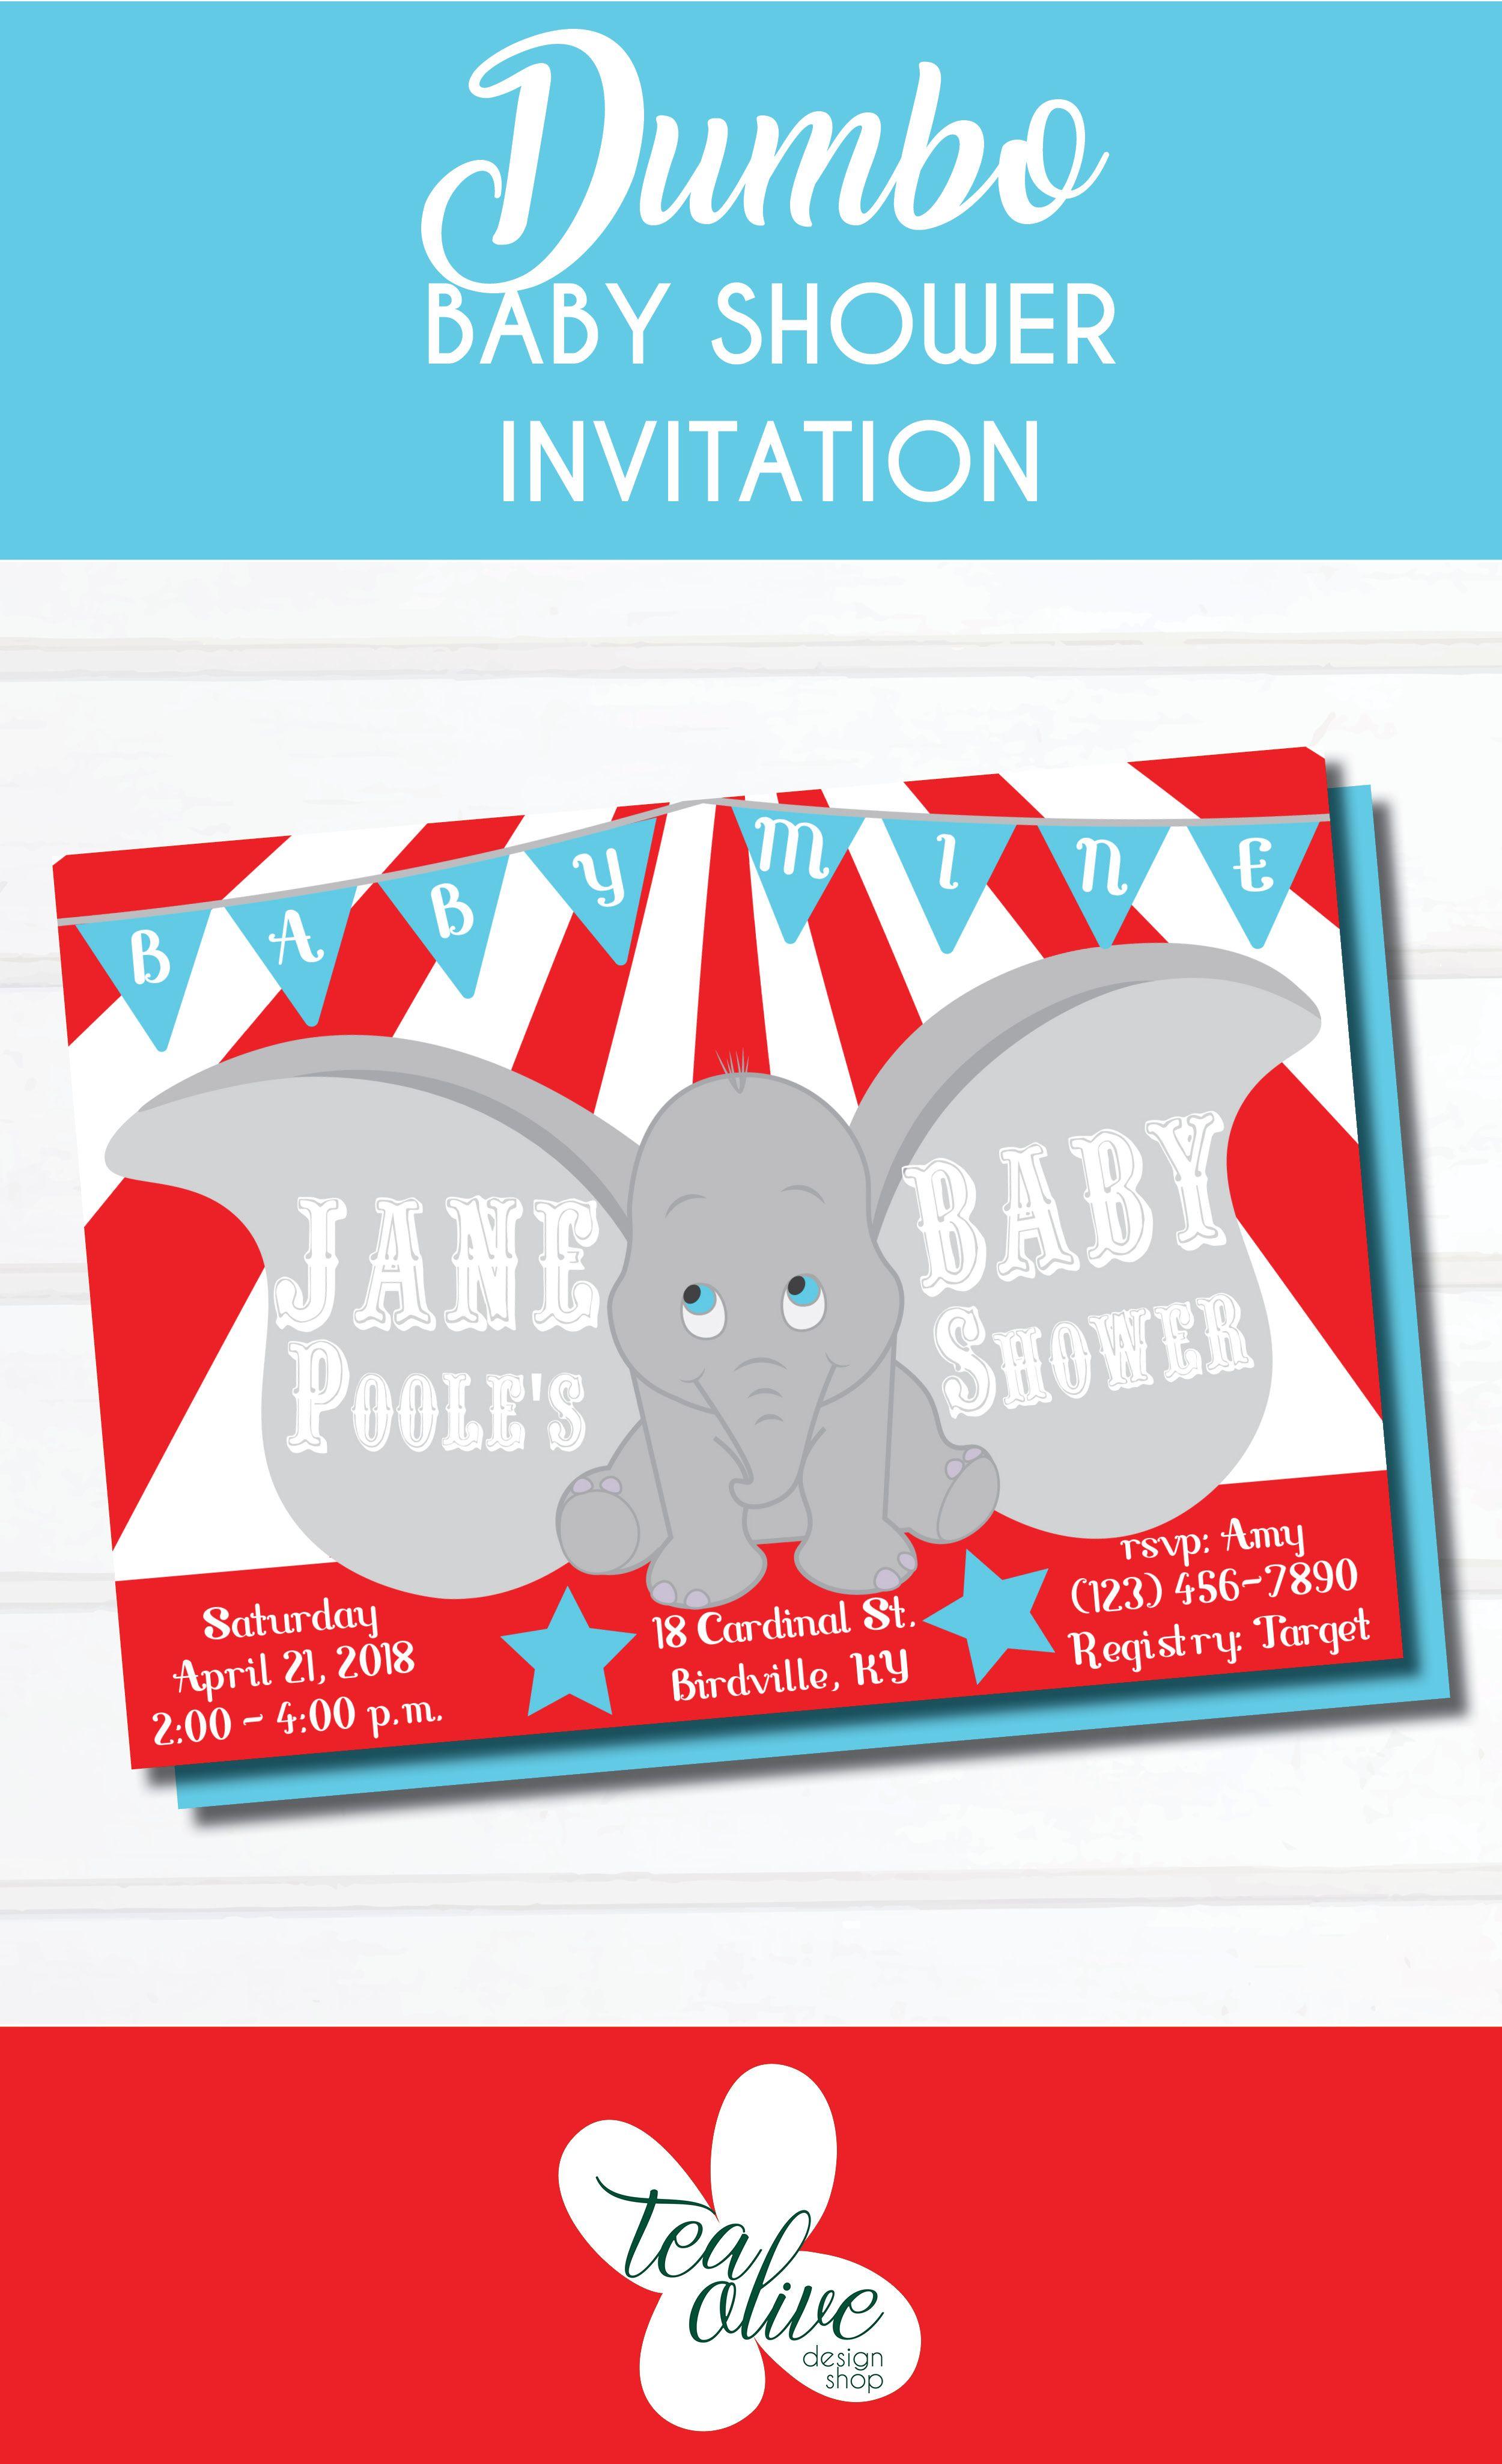 Dumbo Baby Shower Invitation / Baby Mine Disney Inspired / Bright ...